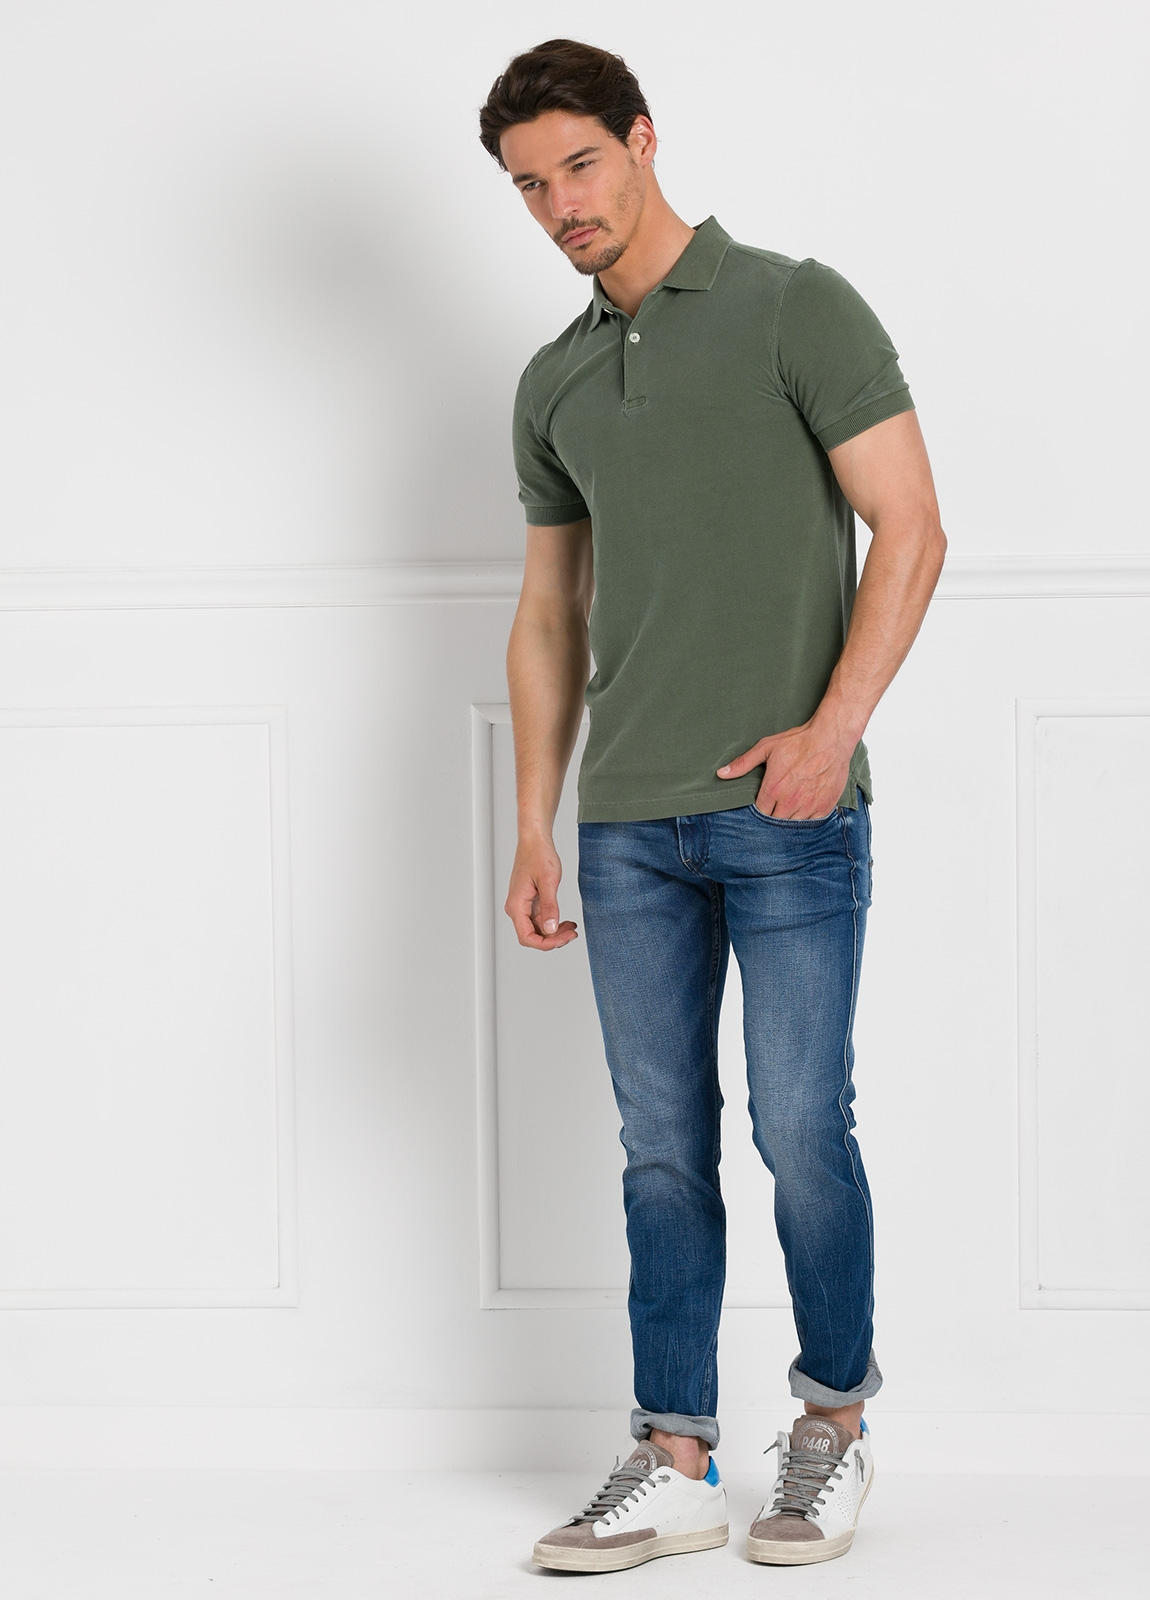 Polo liso manga corta, color verde kaki. 100% Algodón Piqué. - Ítem1